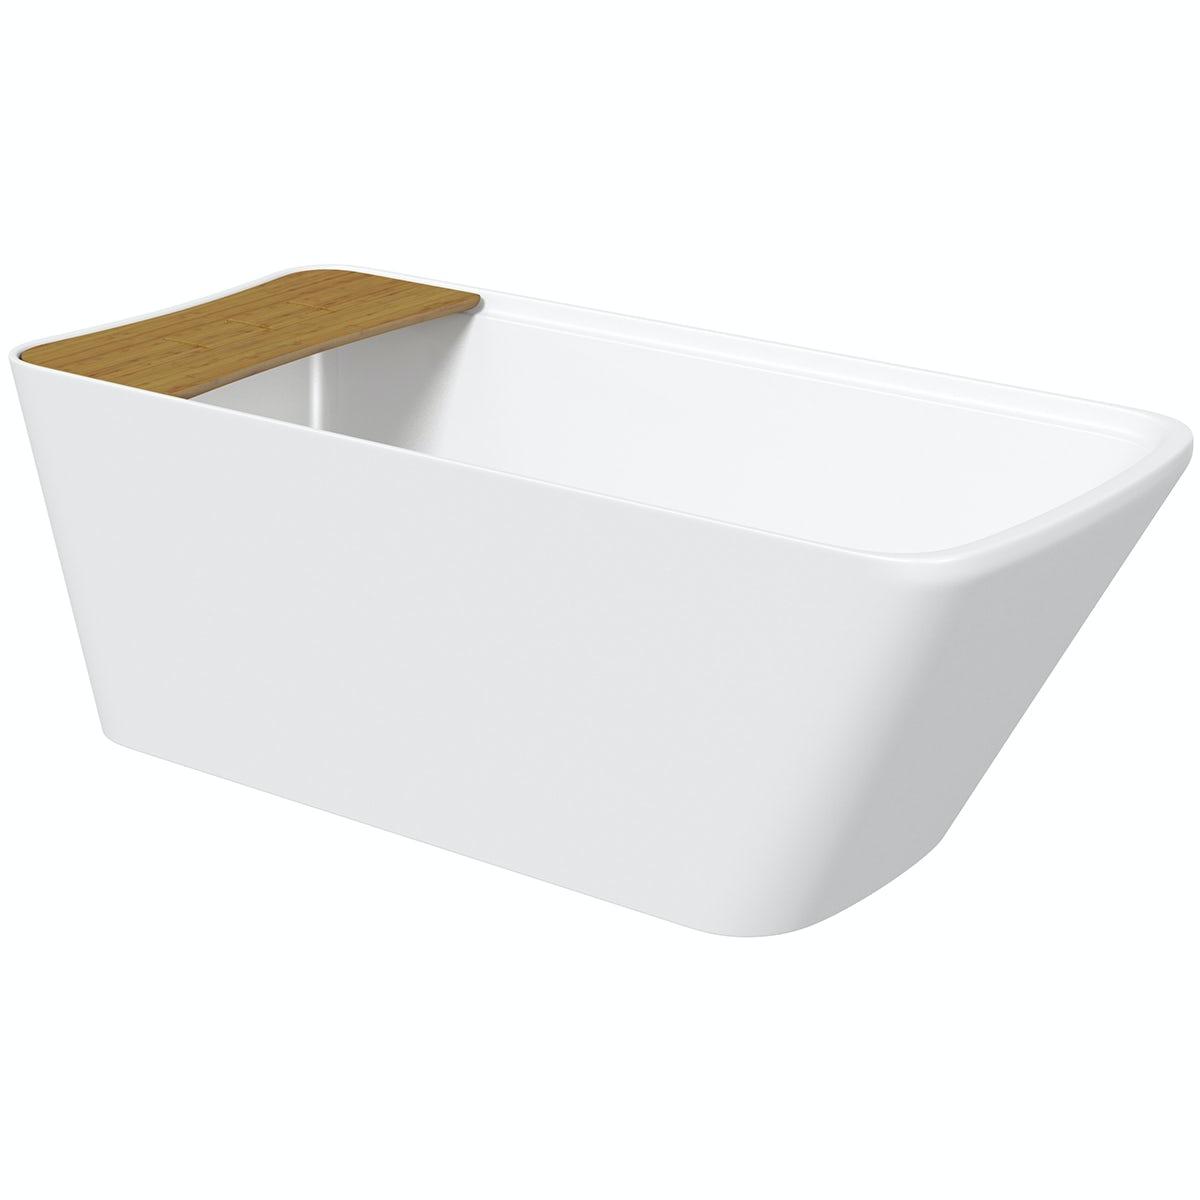 Mode Foster freestanding bath with bamboo bath bridge